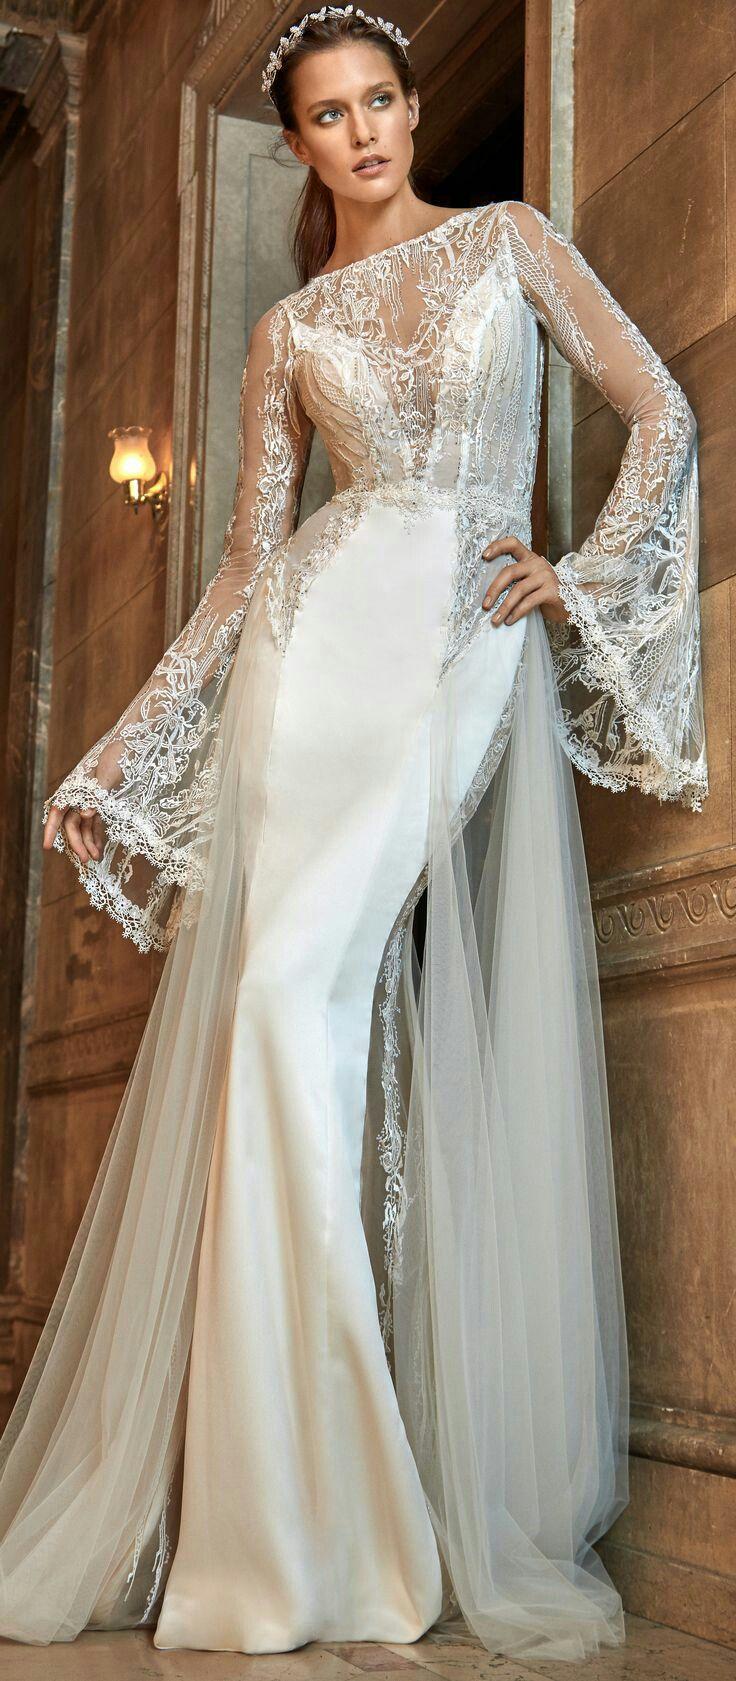 Royal wedding dress  Elegant gown from Galia Lahav Le Secret Royal Part II wedding dress